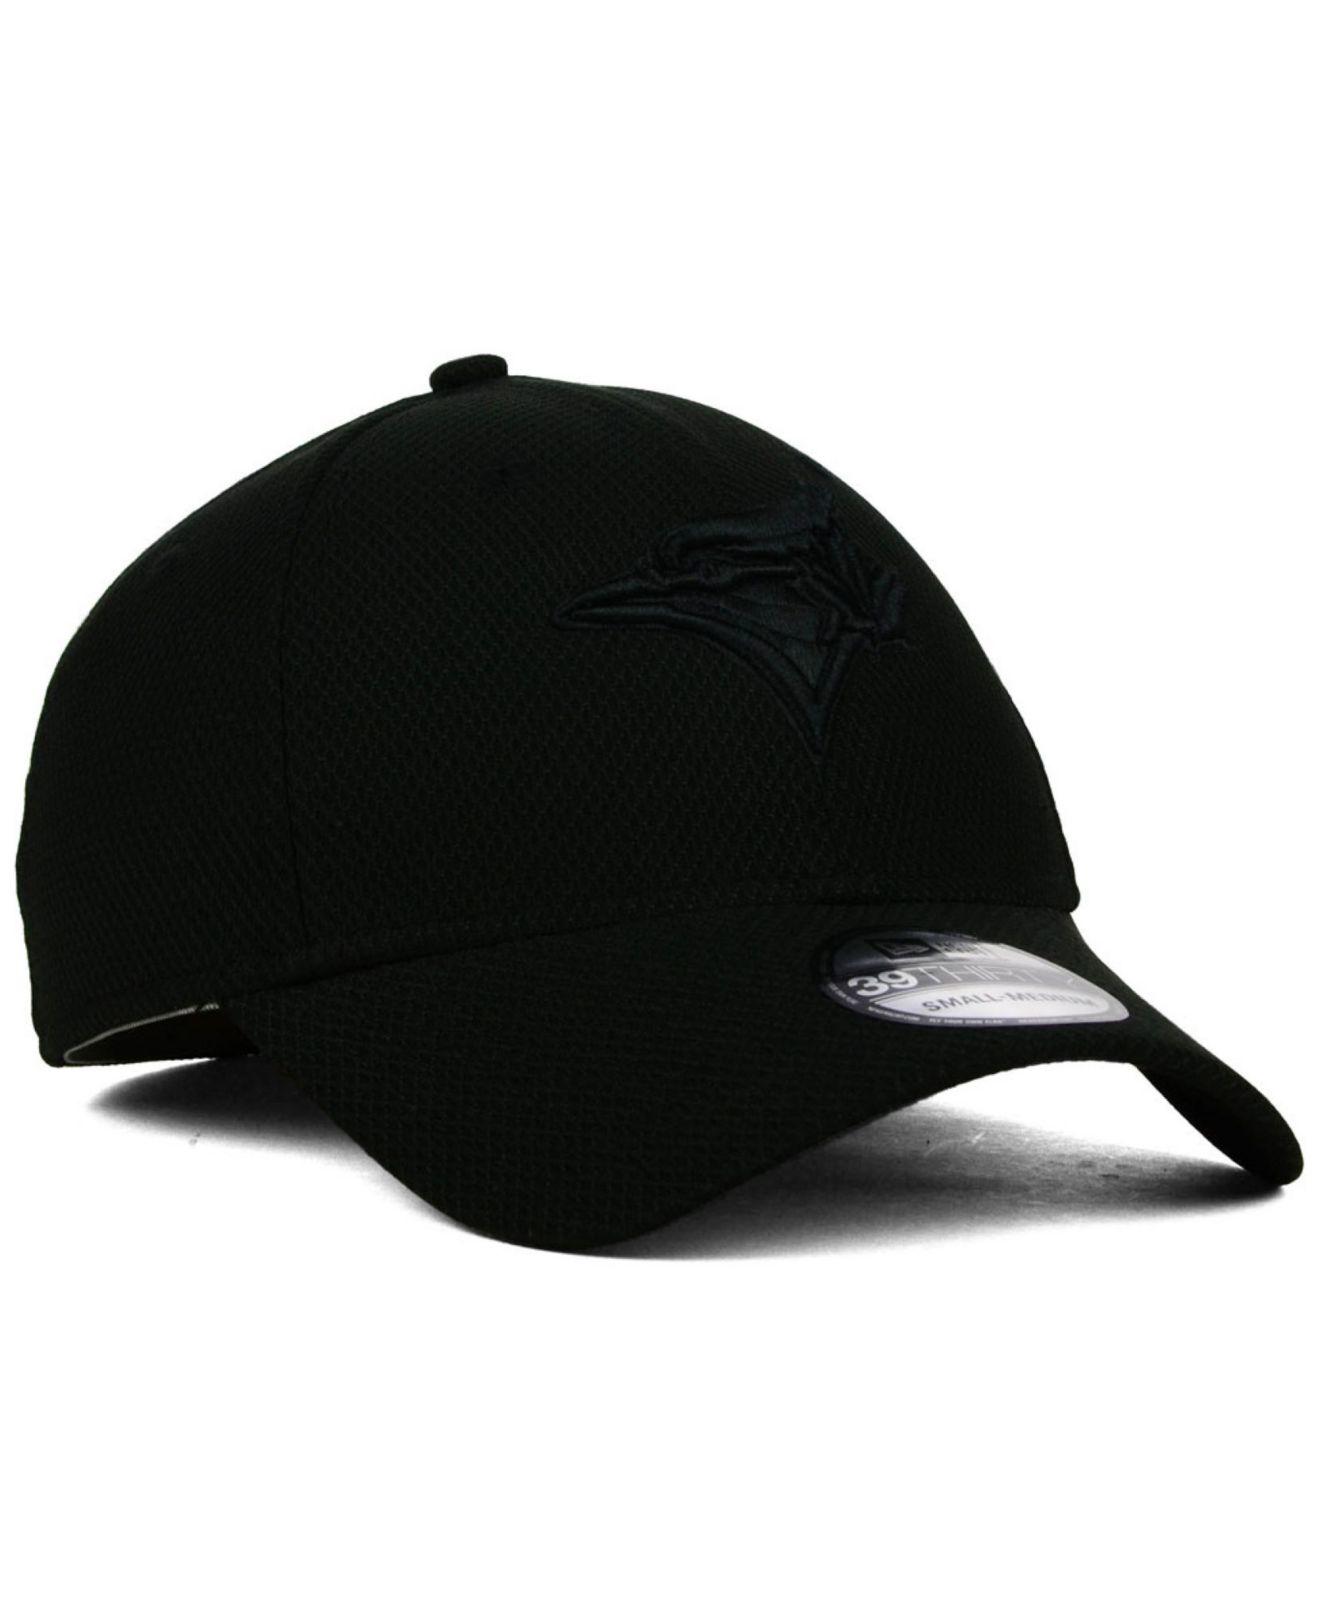 big sale 3fef9 0b915 KTZ Toronto Blue Jays Black Diamond Era 39Thirty Cap in Black for ...